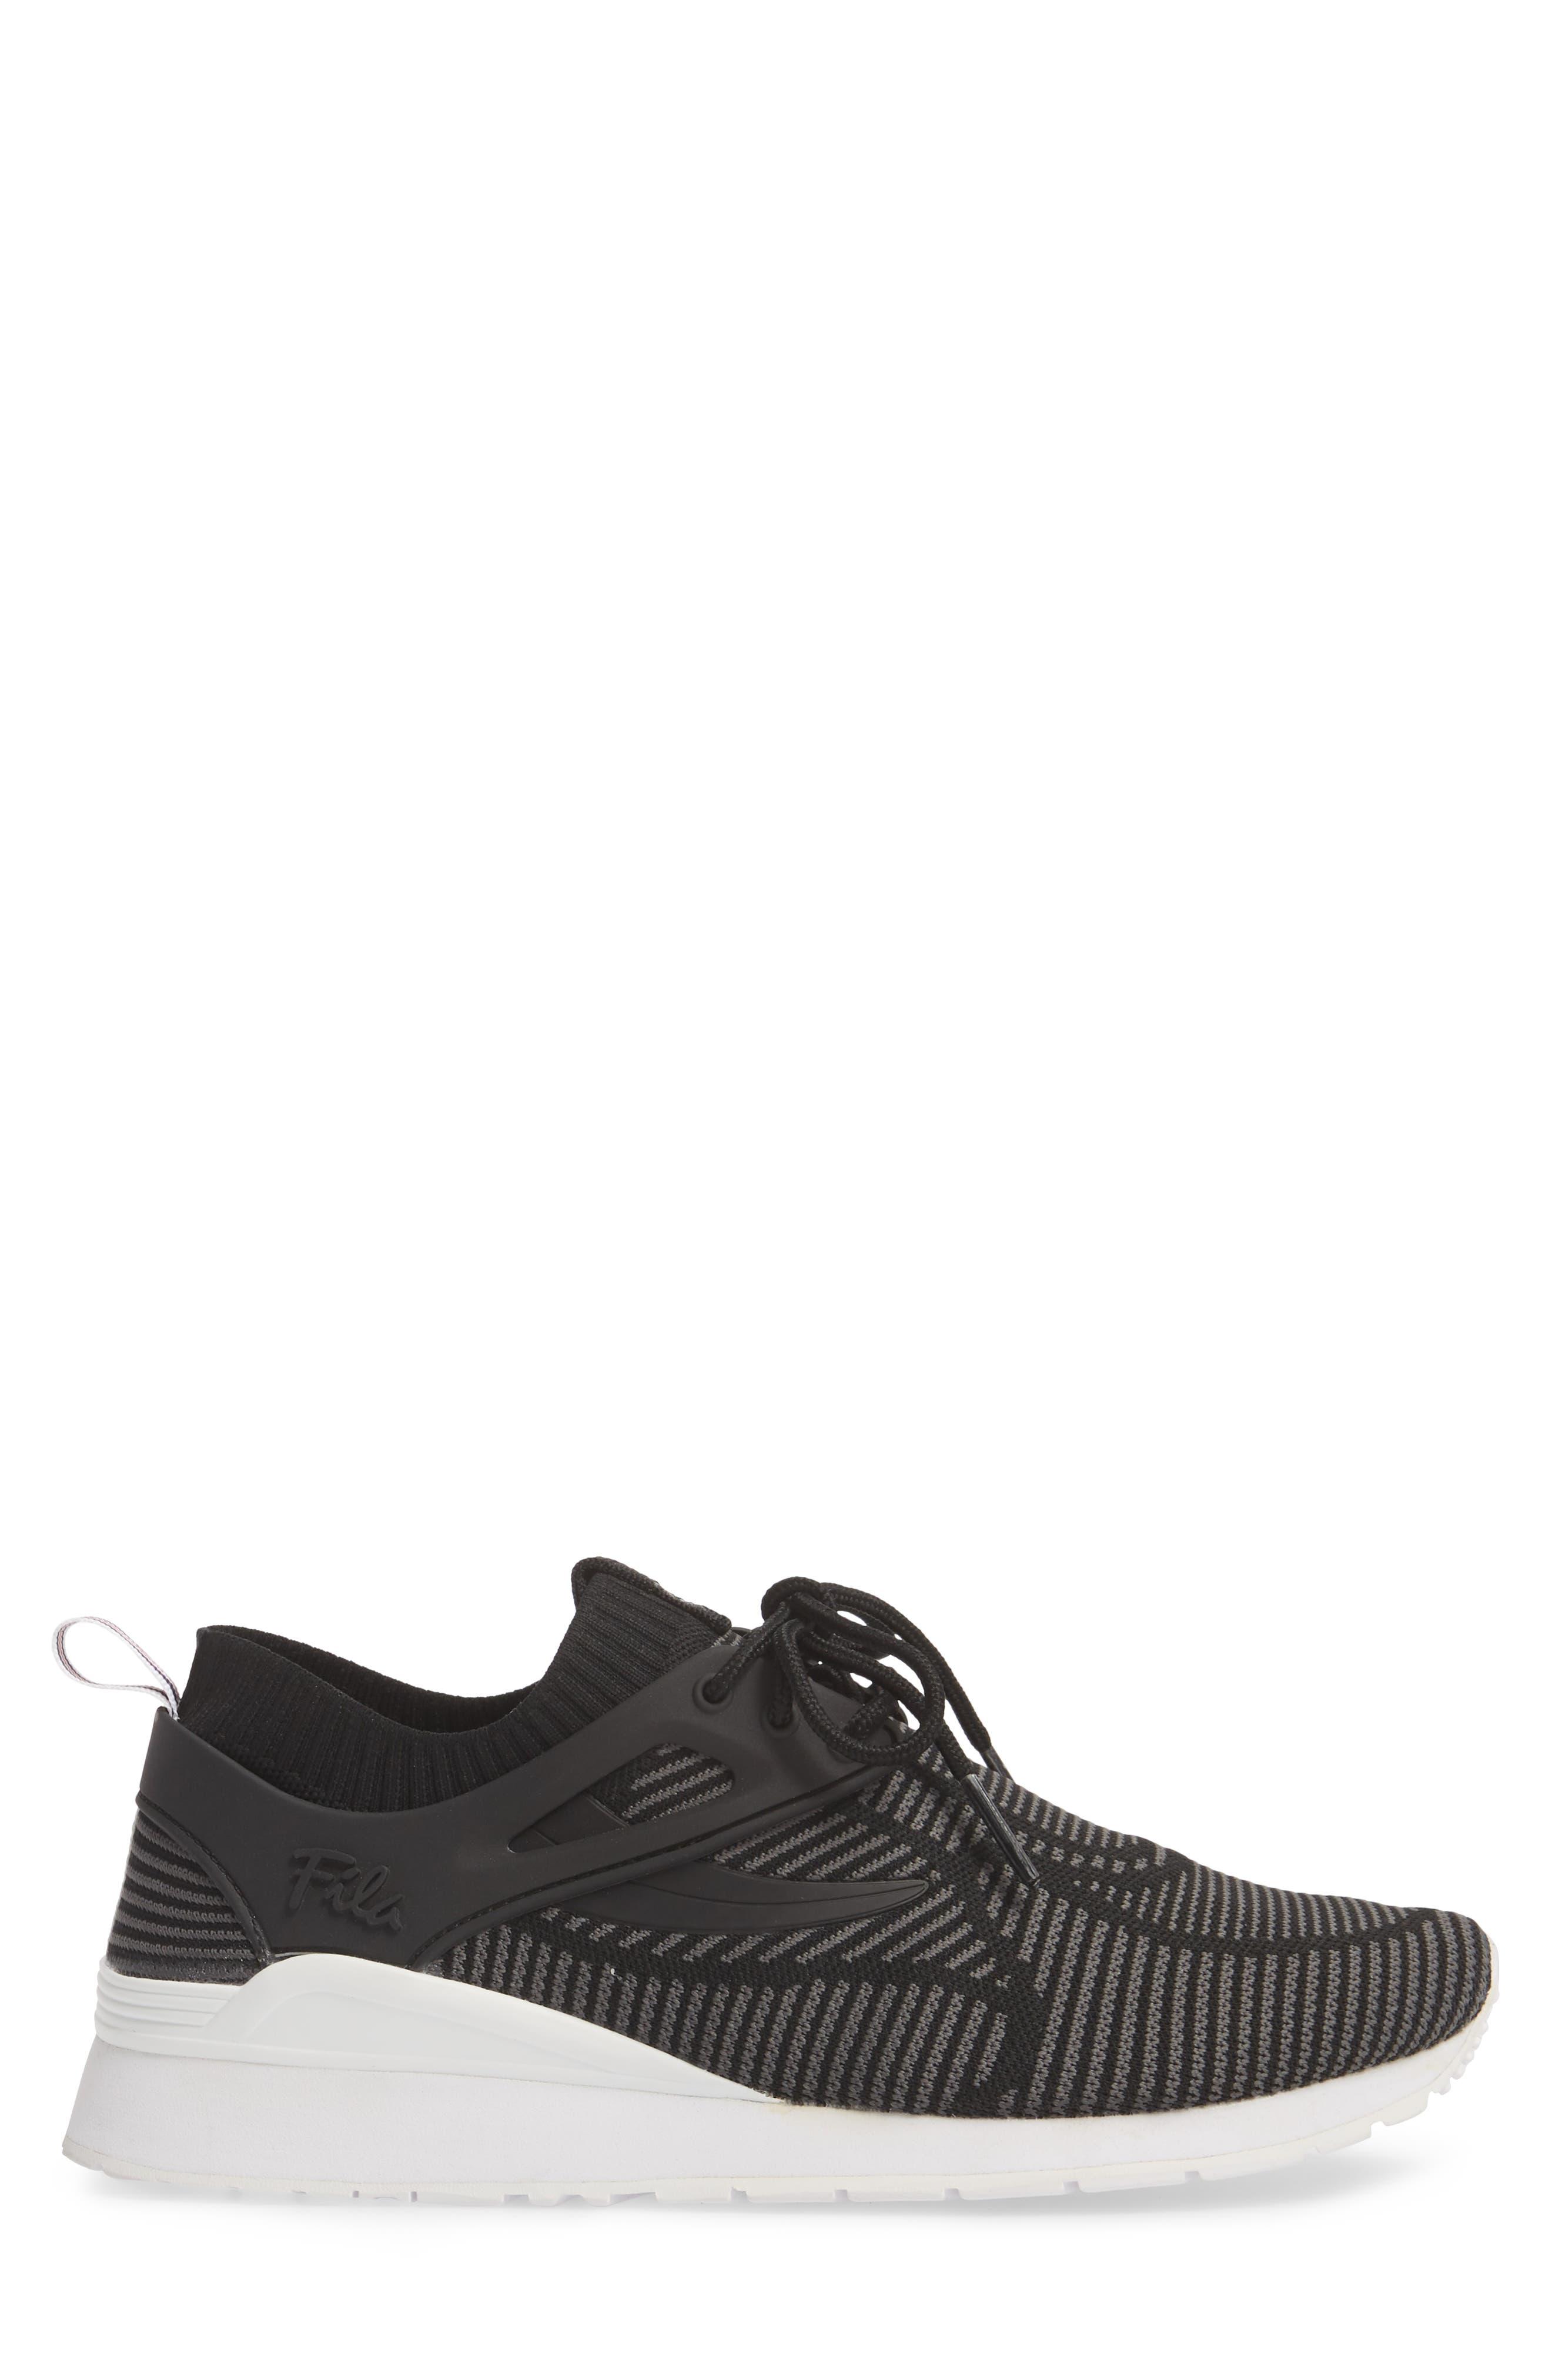 Overpass 2.0 Knit Sneaker,                             Alternate thumbnail 3, color,                             003